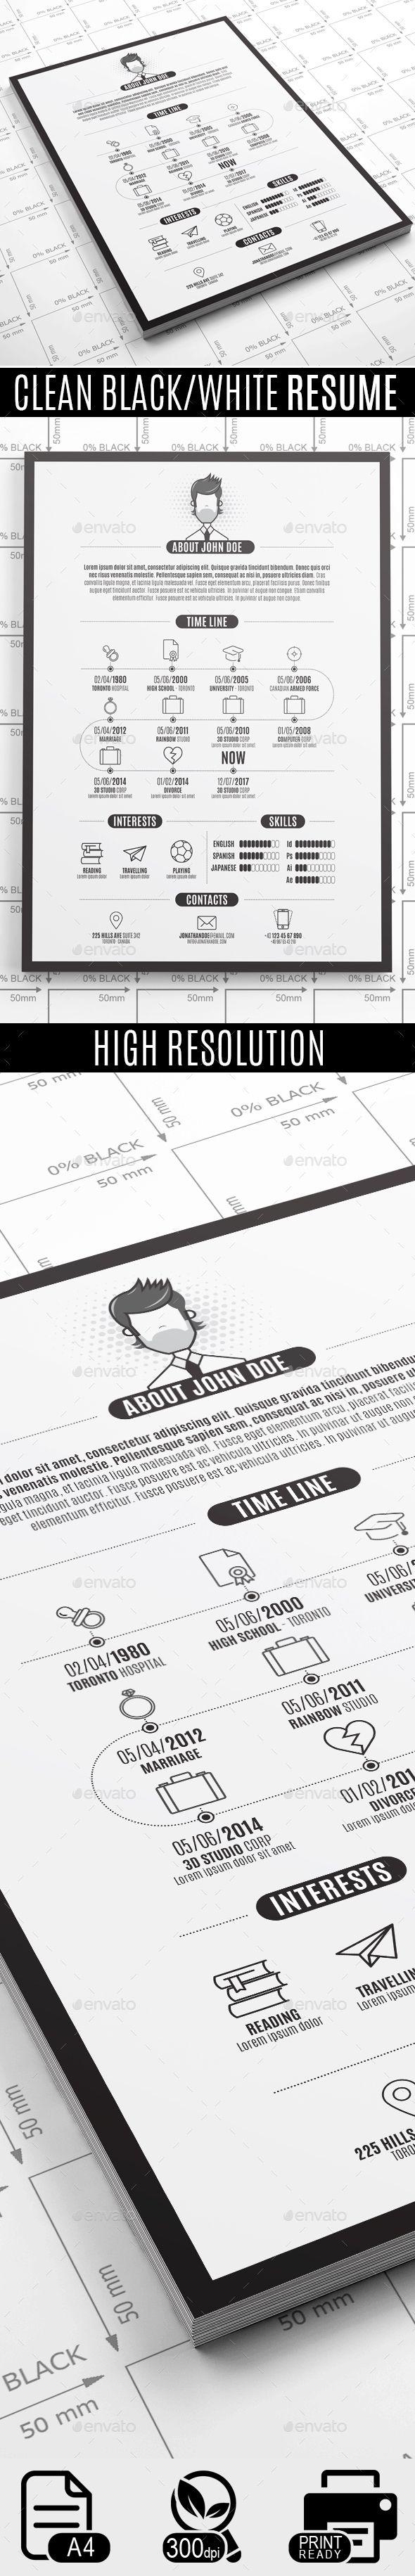 Clean Black White Resume